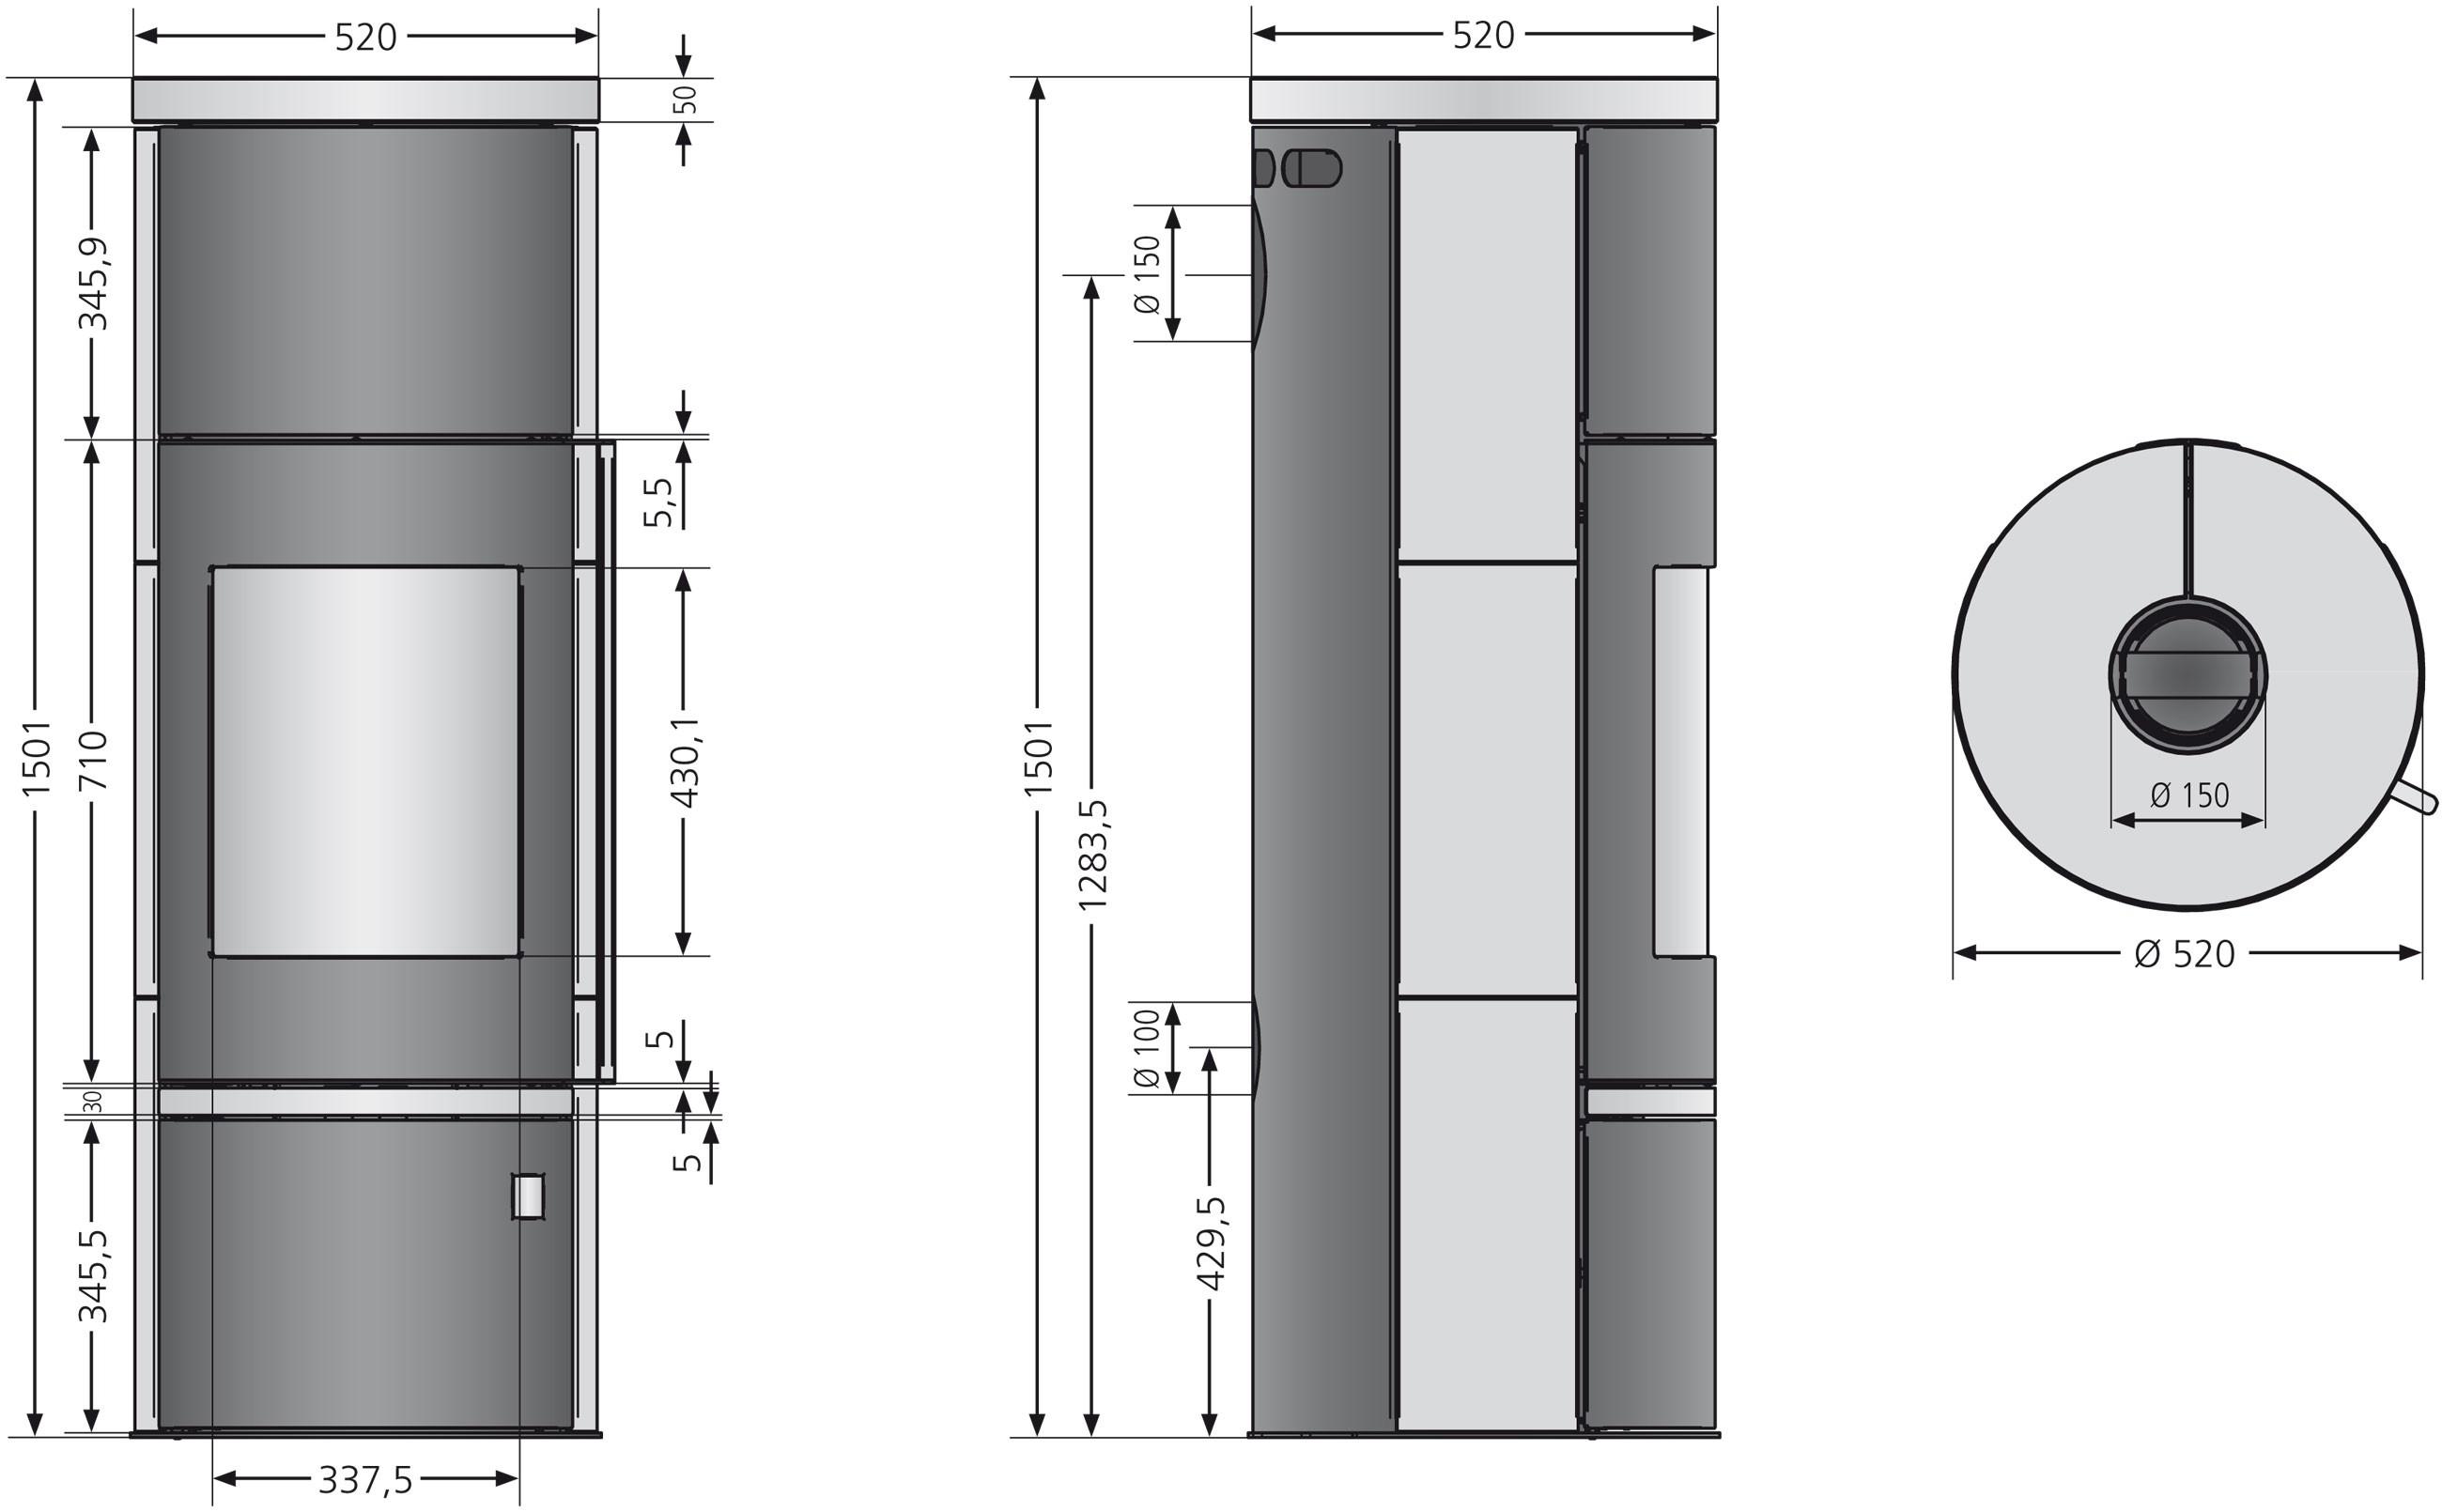 Kaminofen Justus Faro W+ 2.0 raumluftunabhängig Stahl schwarz Glas 7kW Bild 11